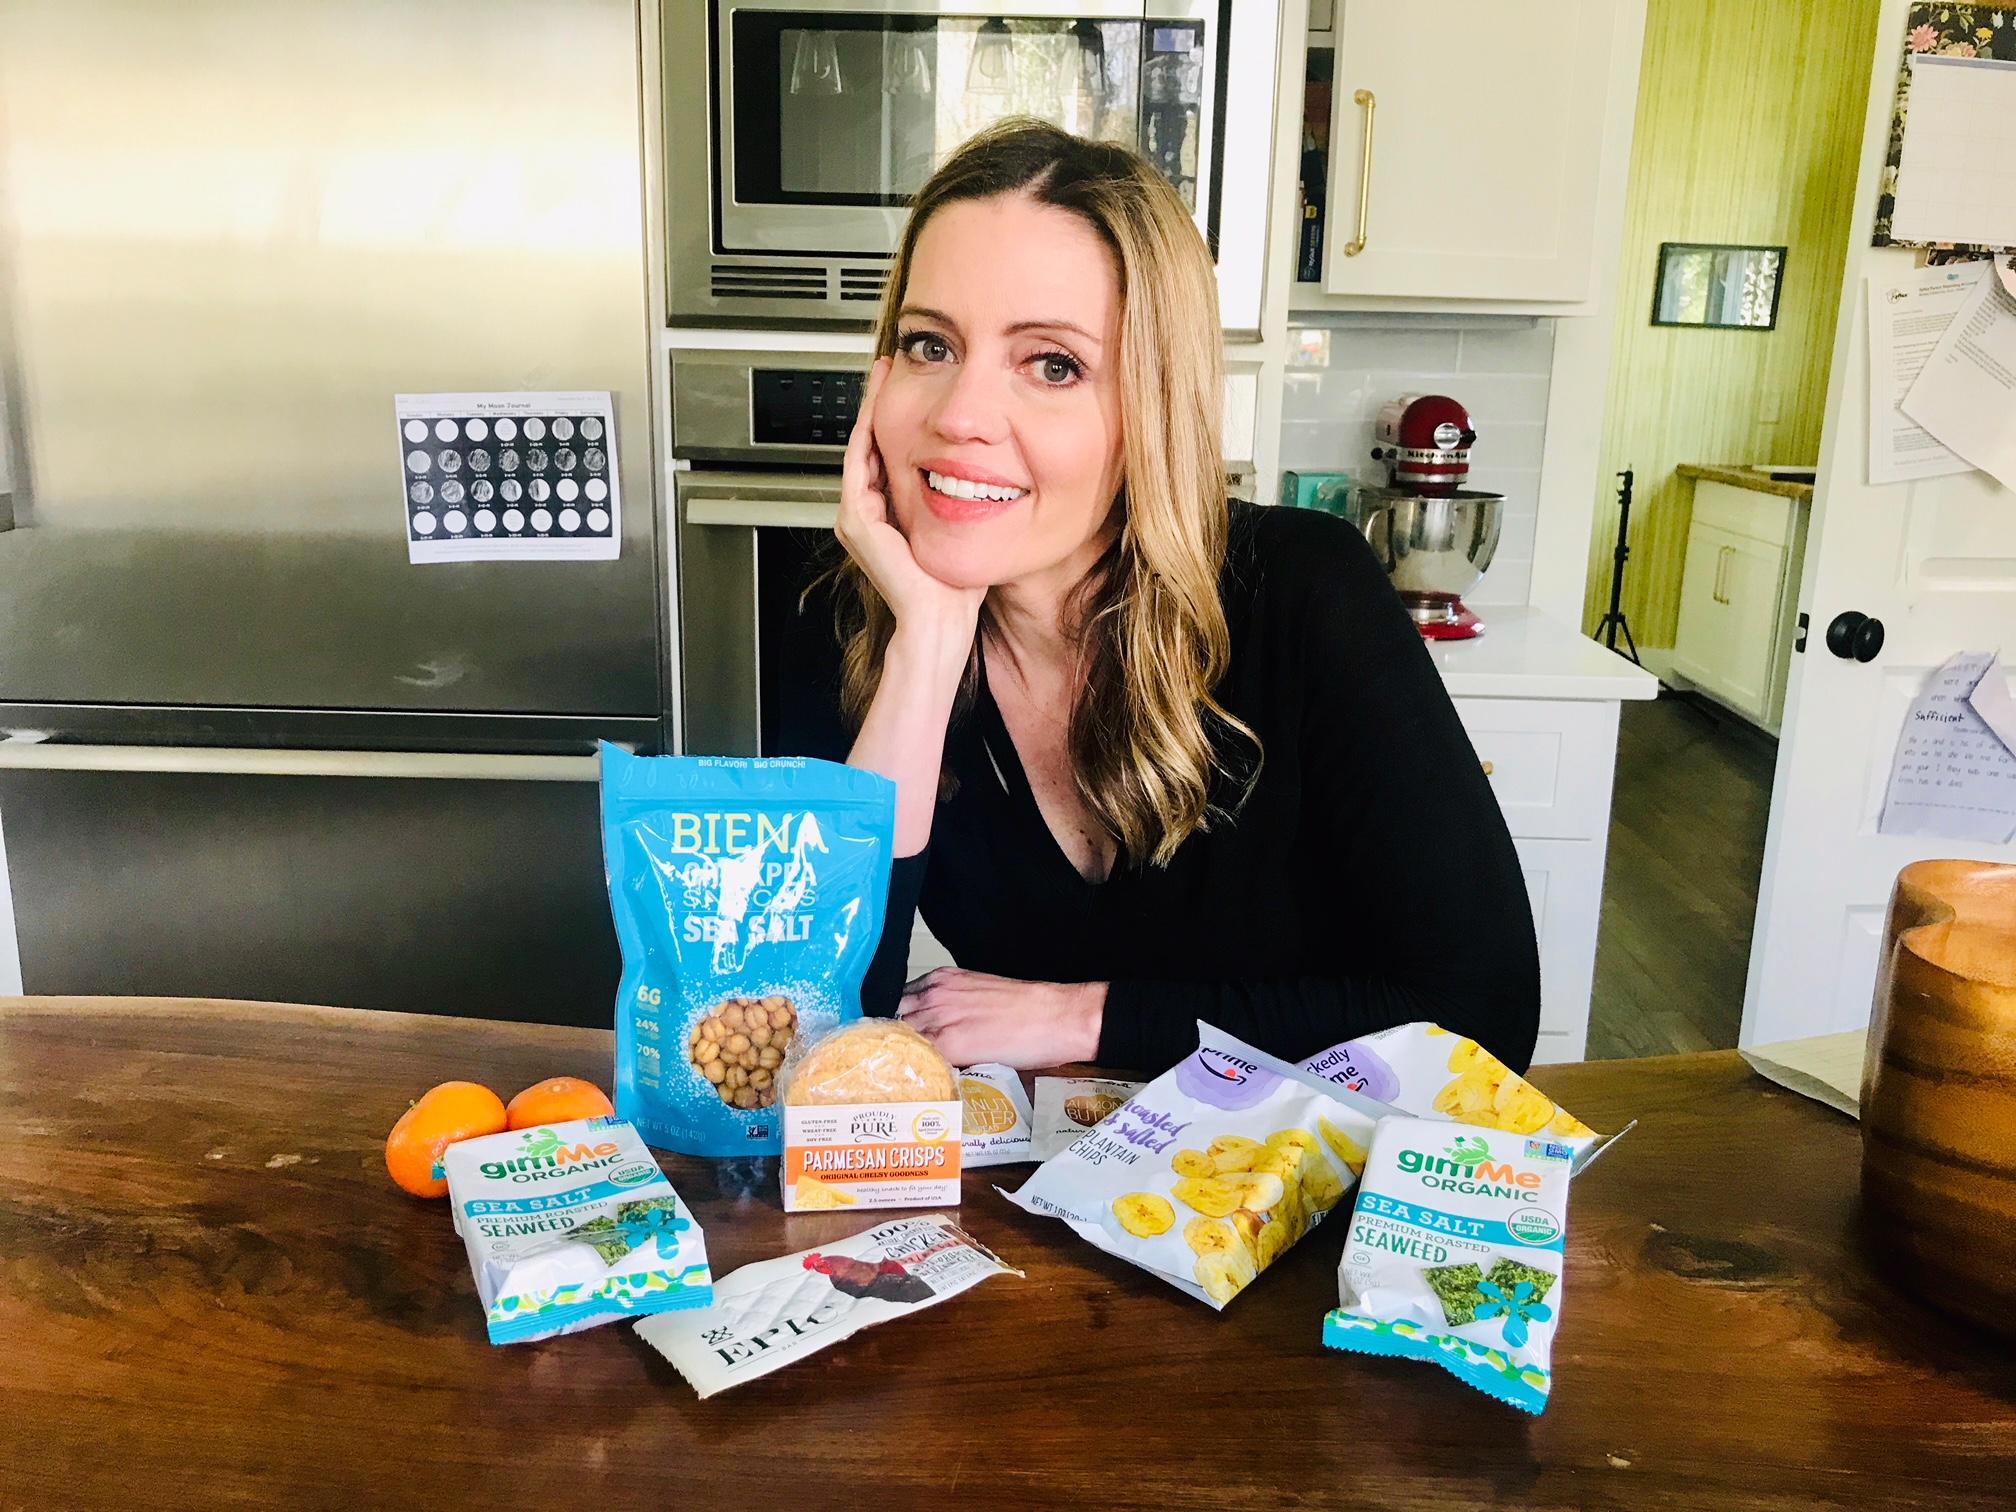 Top 10(ish) Healthy(ish) On-the-Go Snacks